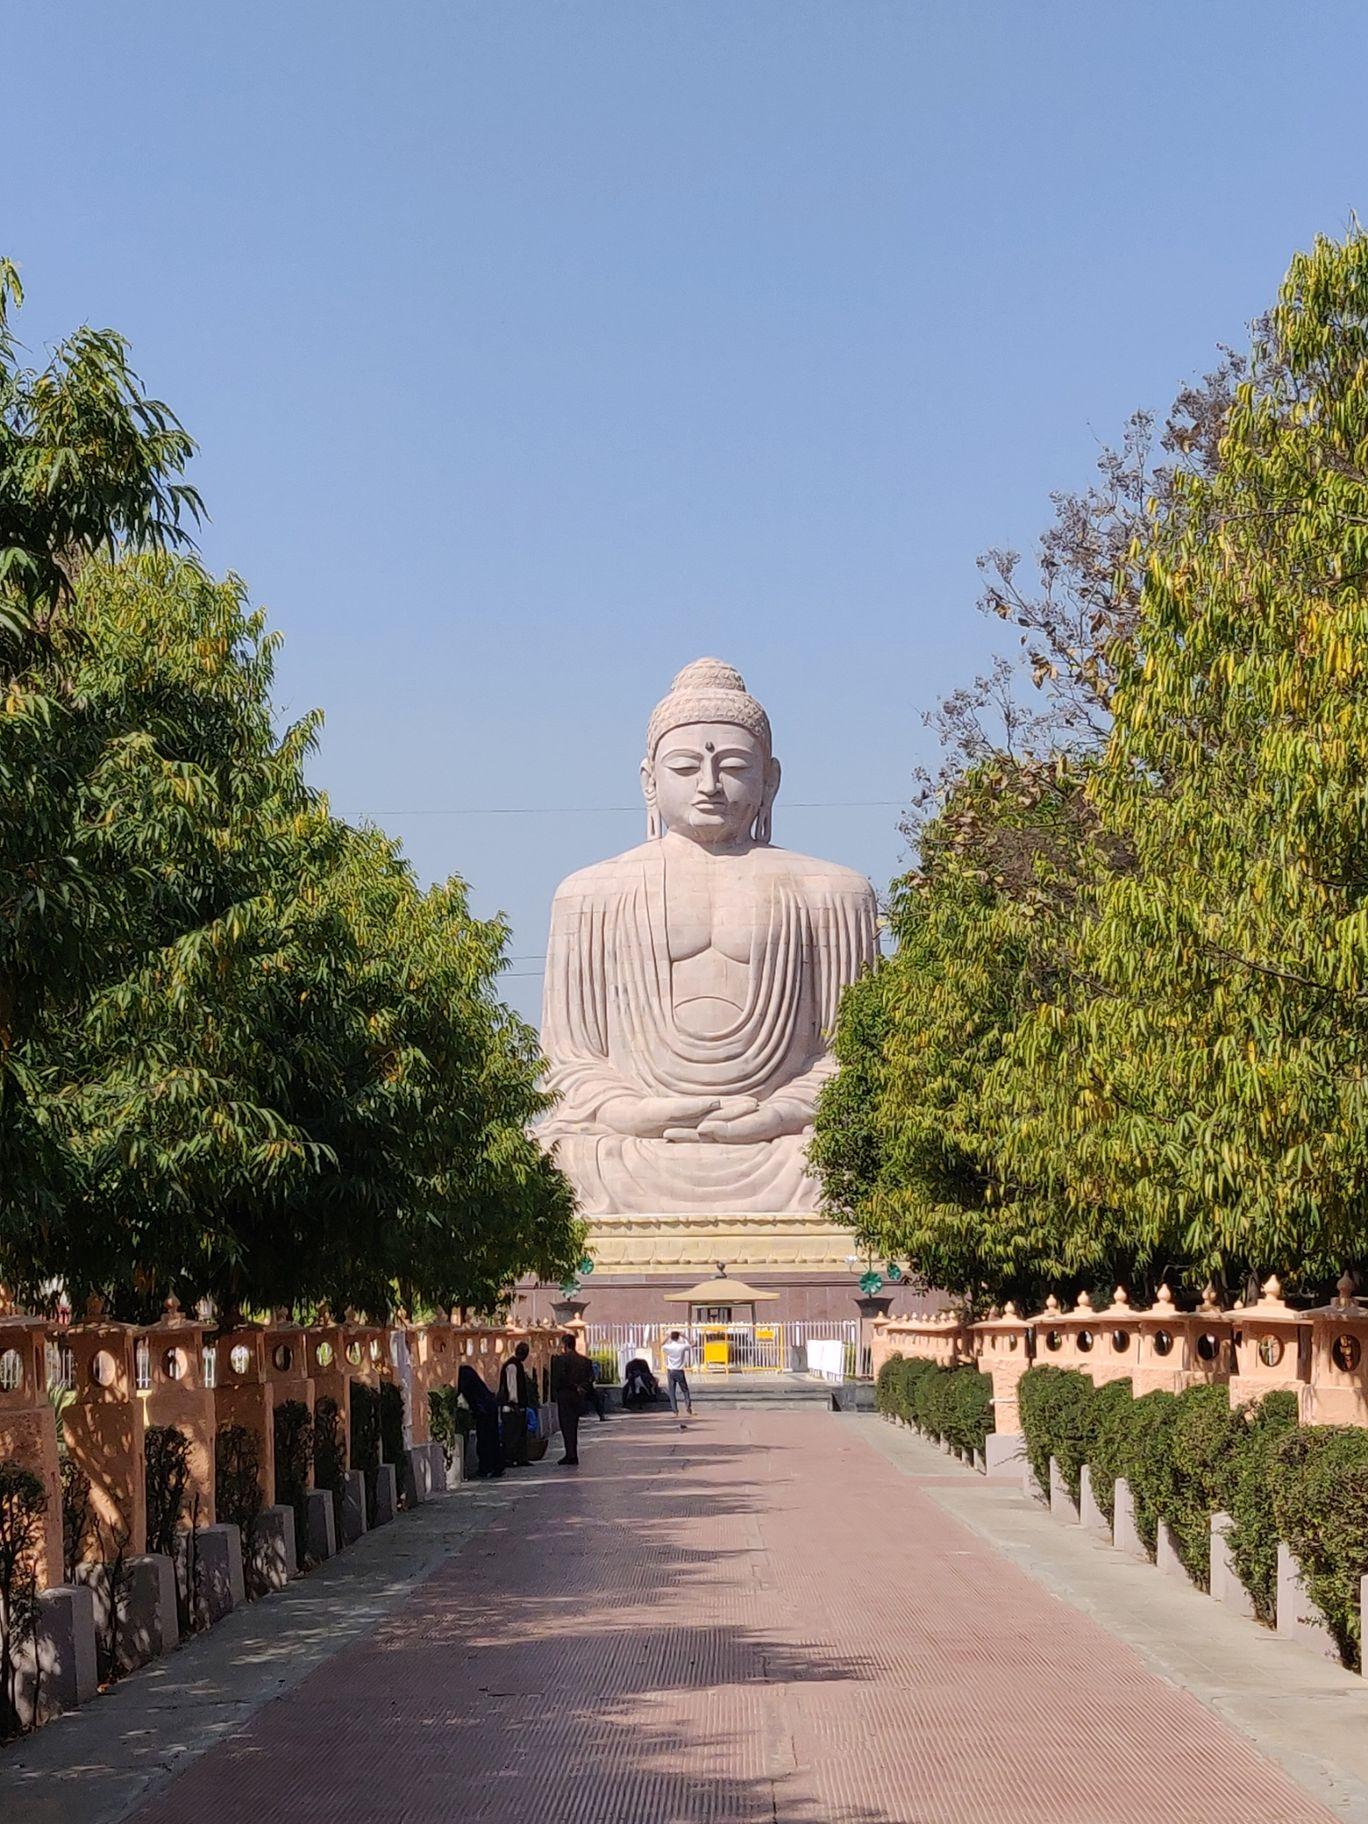 Photo of Bodh Gaya By Anshuman Priyadarshi